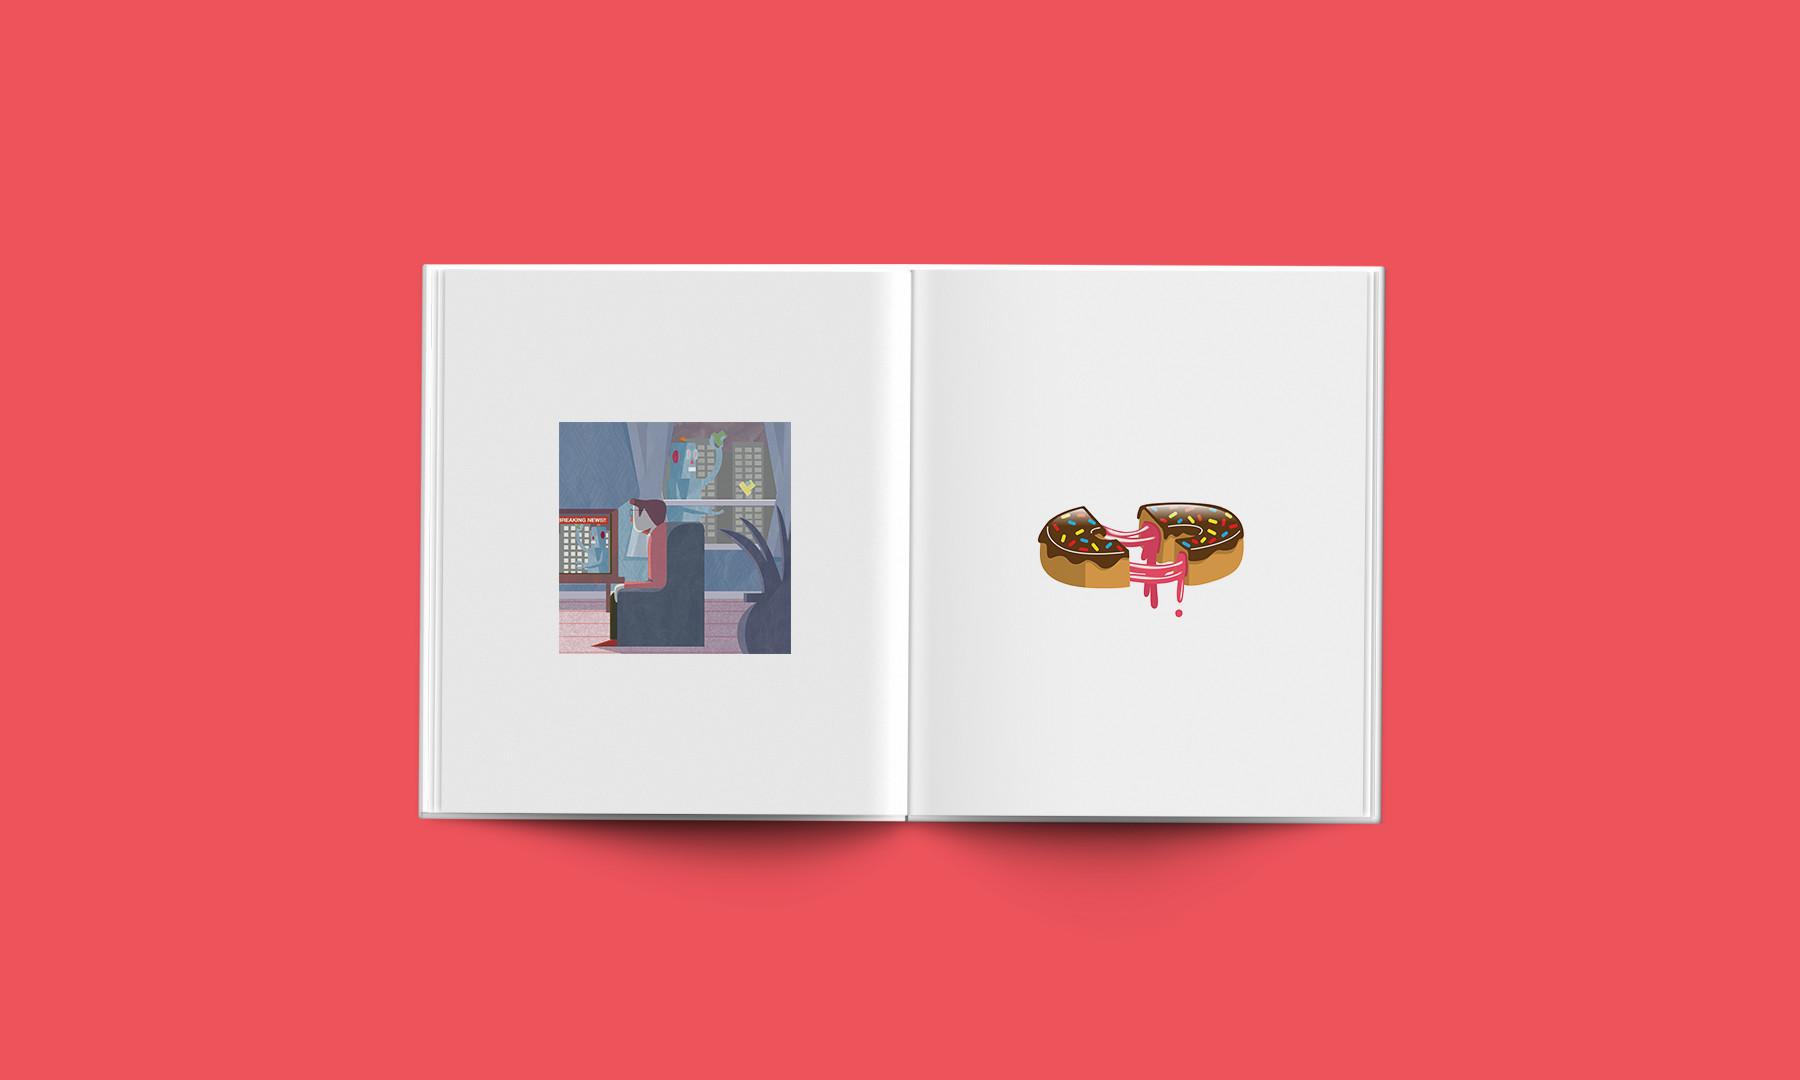 robot-donut-red.jpg